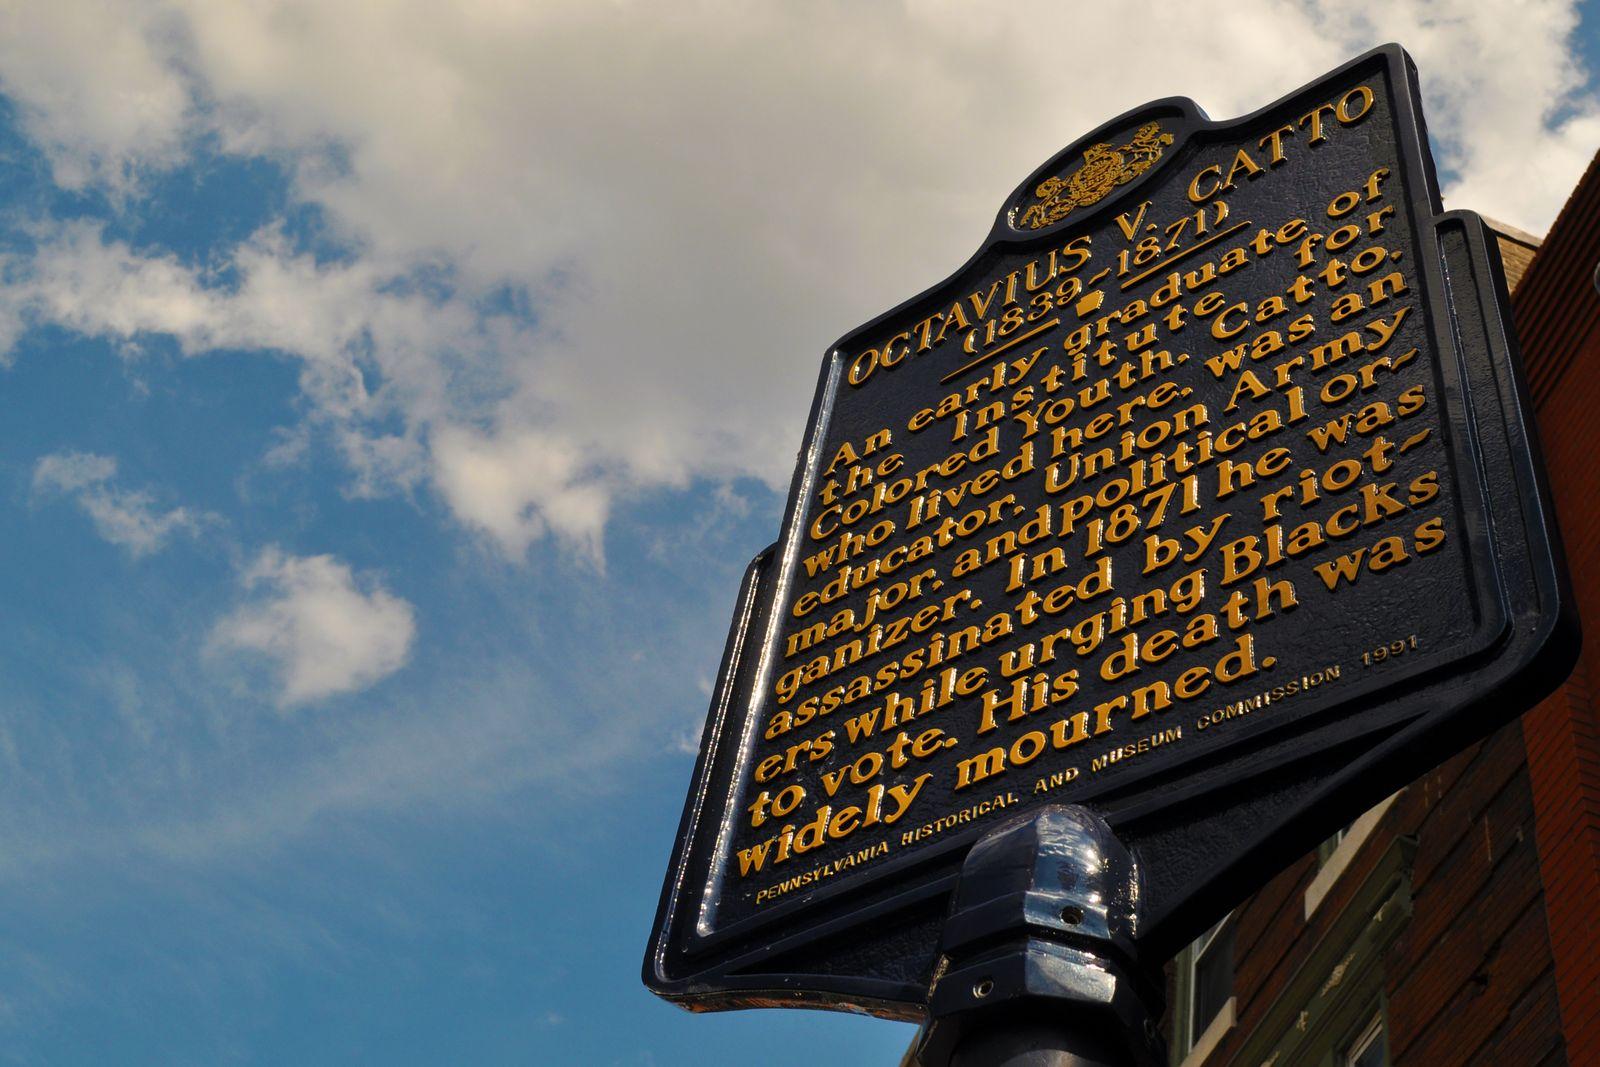 Octavius V Catto Home Historical Marker 812 South St Philadelphia PA 19147